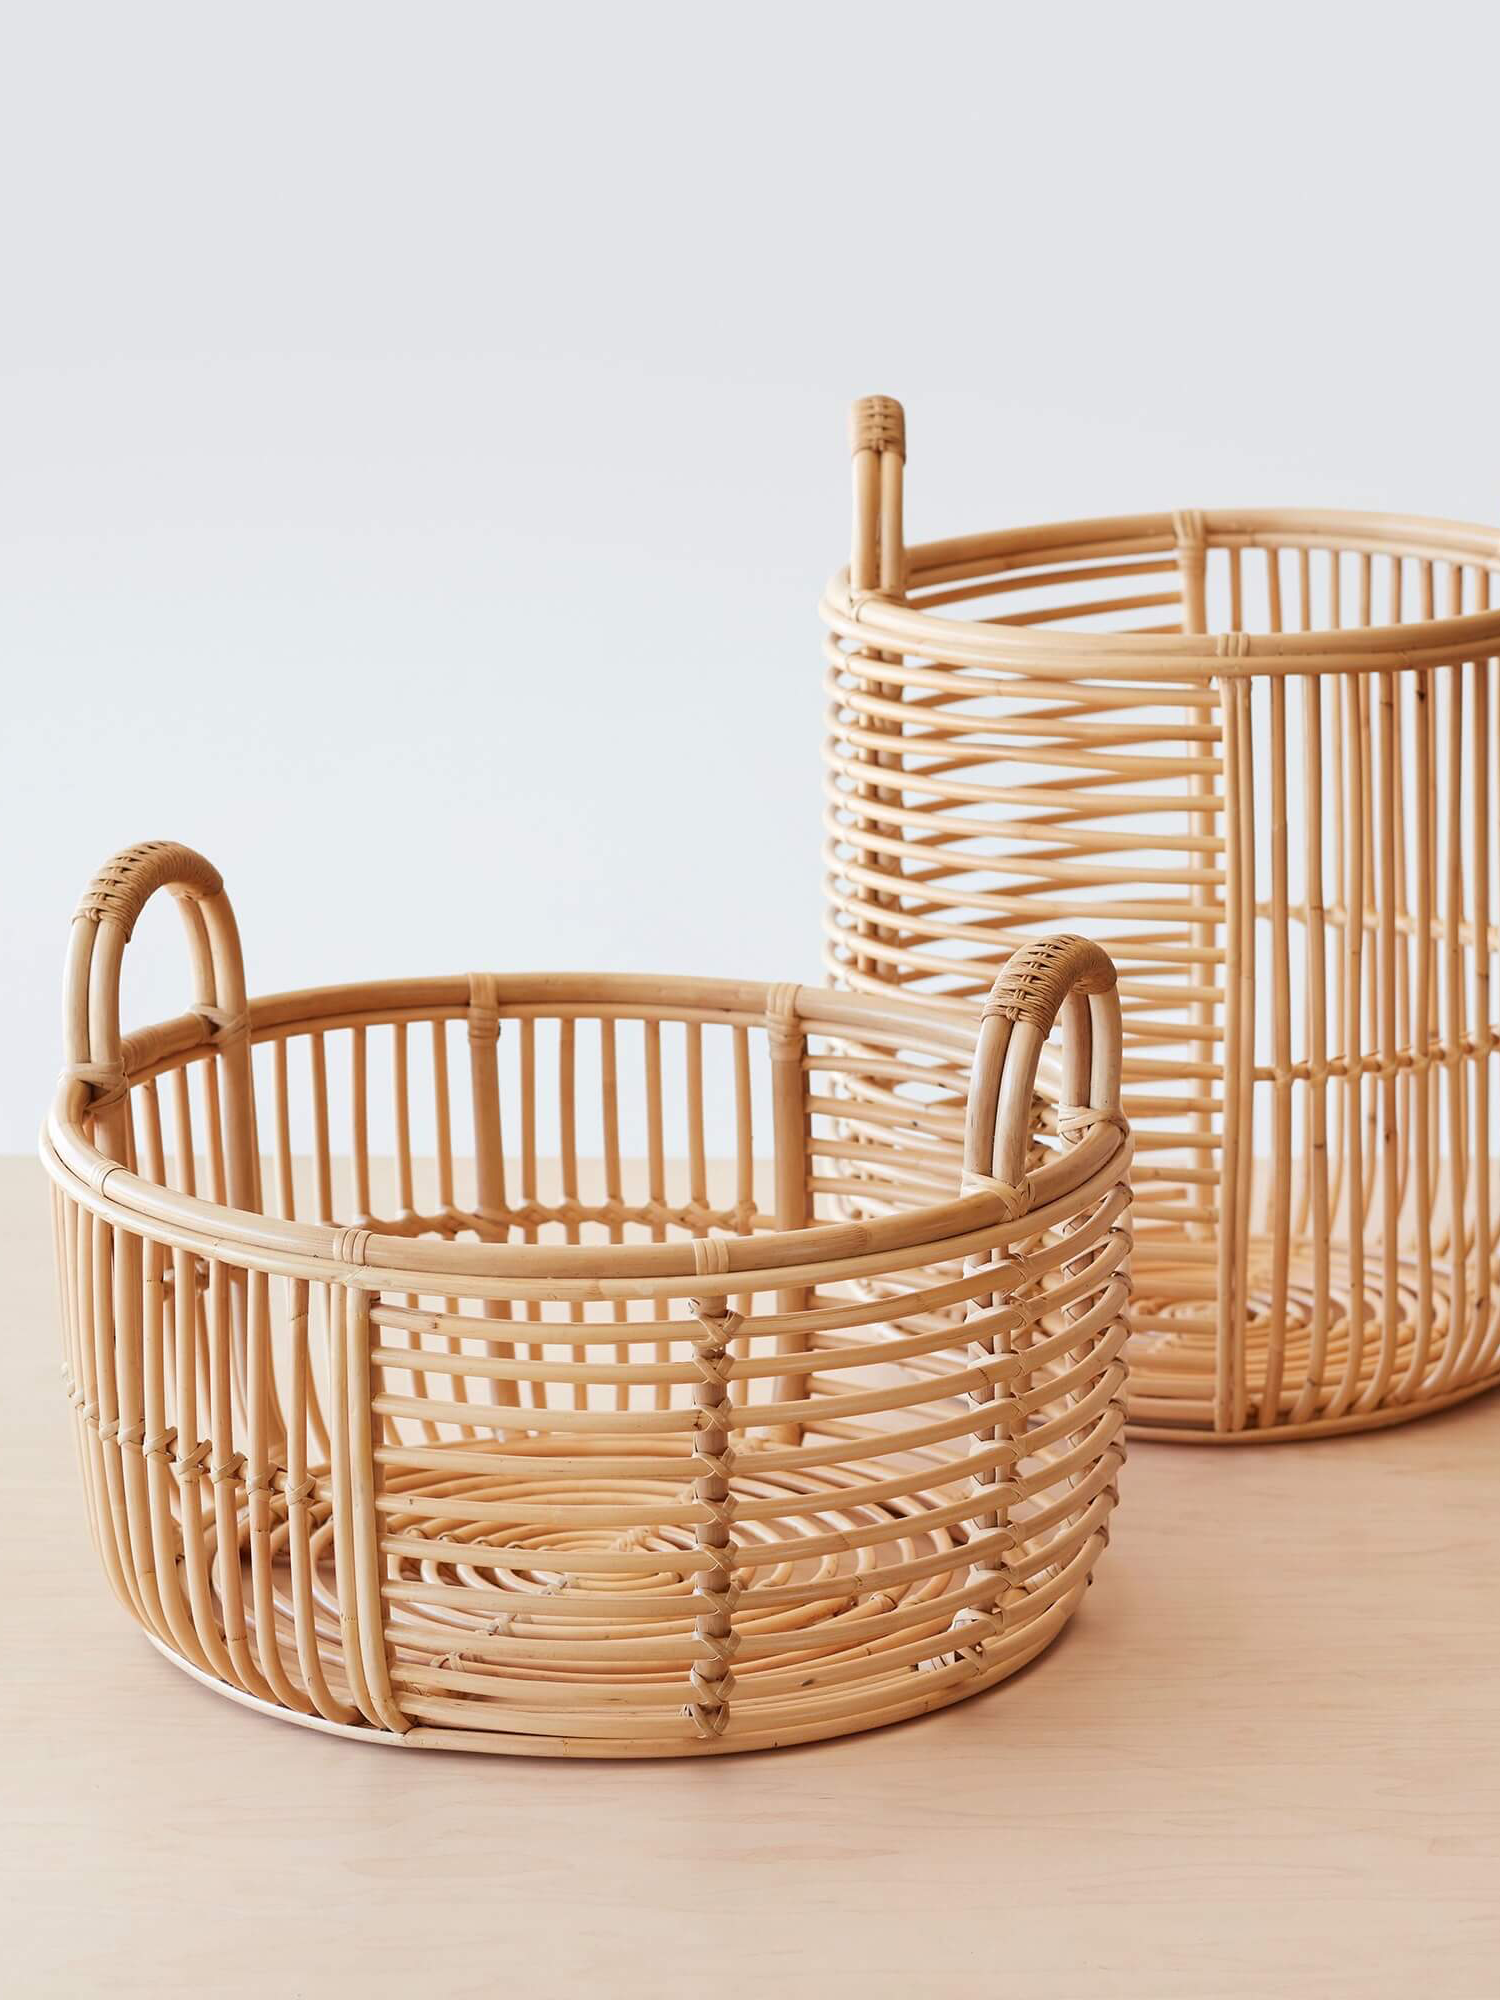 Fair Trade Baskets and Woven Bowls - Java Rattan Baskets